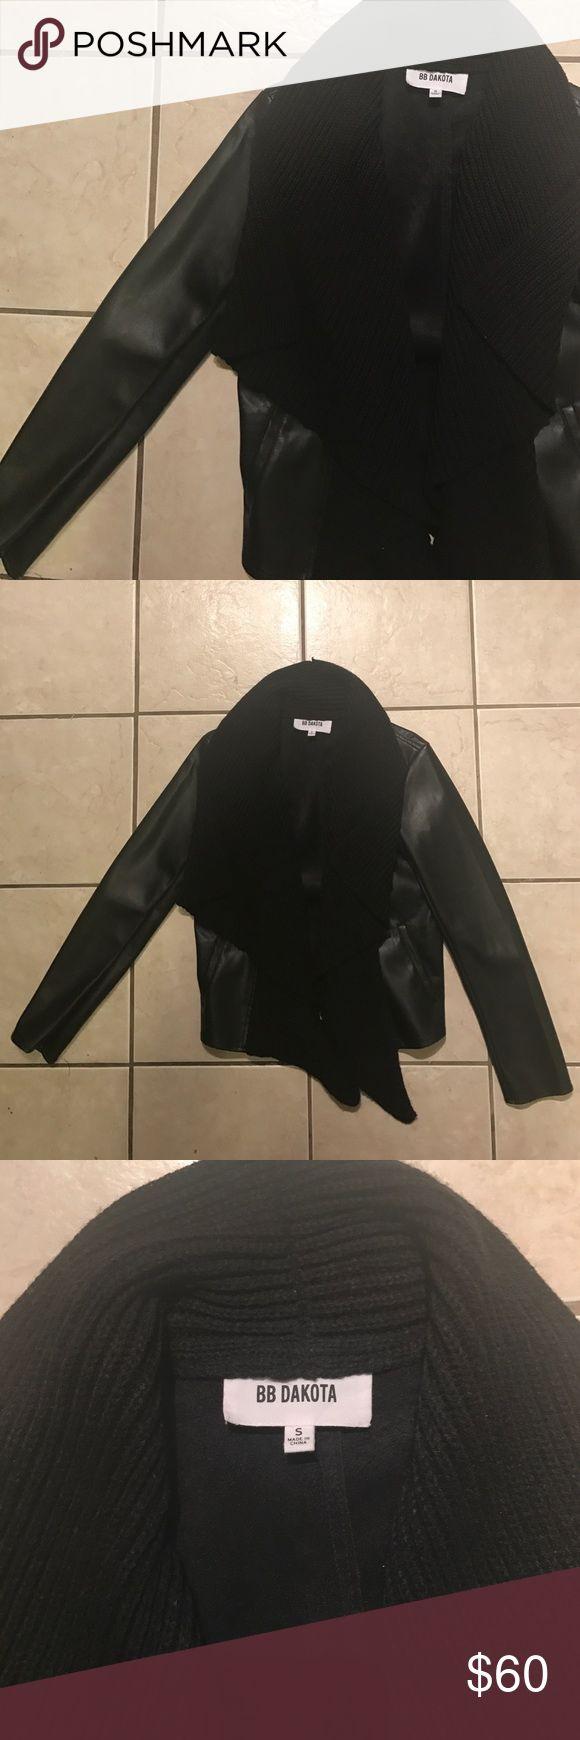 BB Dakota jacket Black BB Dakota jacket. Attached sweater collar/scarf detail. Inside is very soft Faux suede. BB Dakota Jackets & Coats